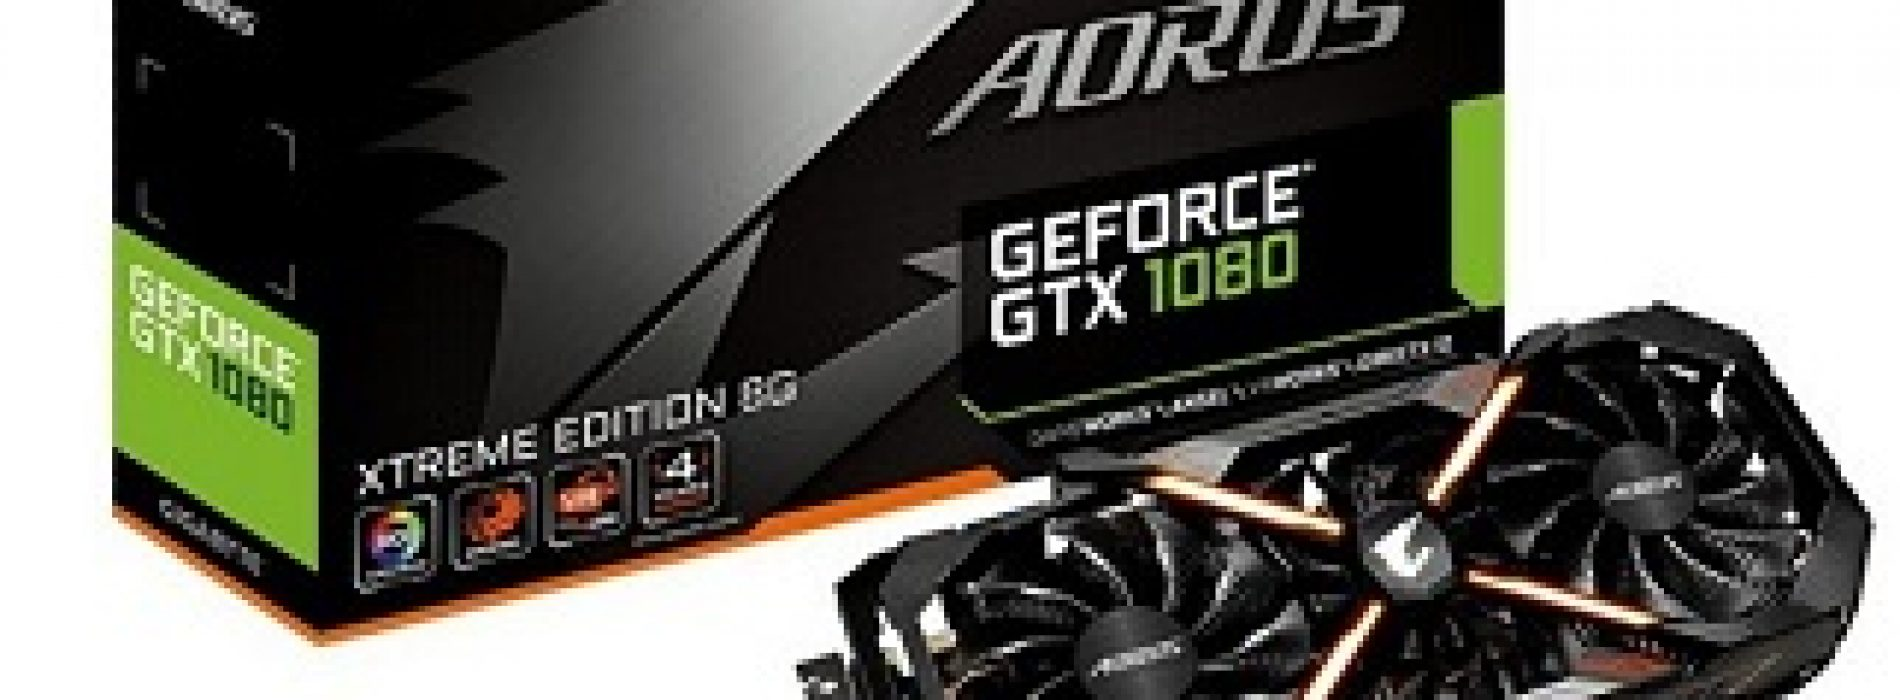 GeForce GTX nueva tarjeta gráfica de gama alta